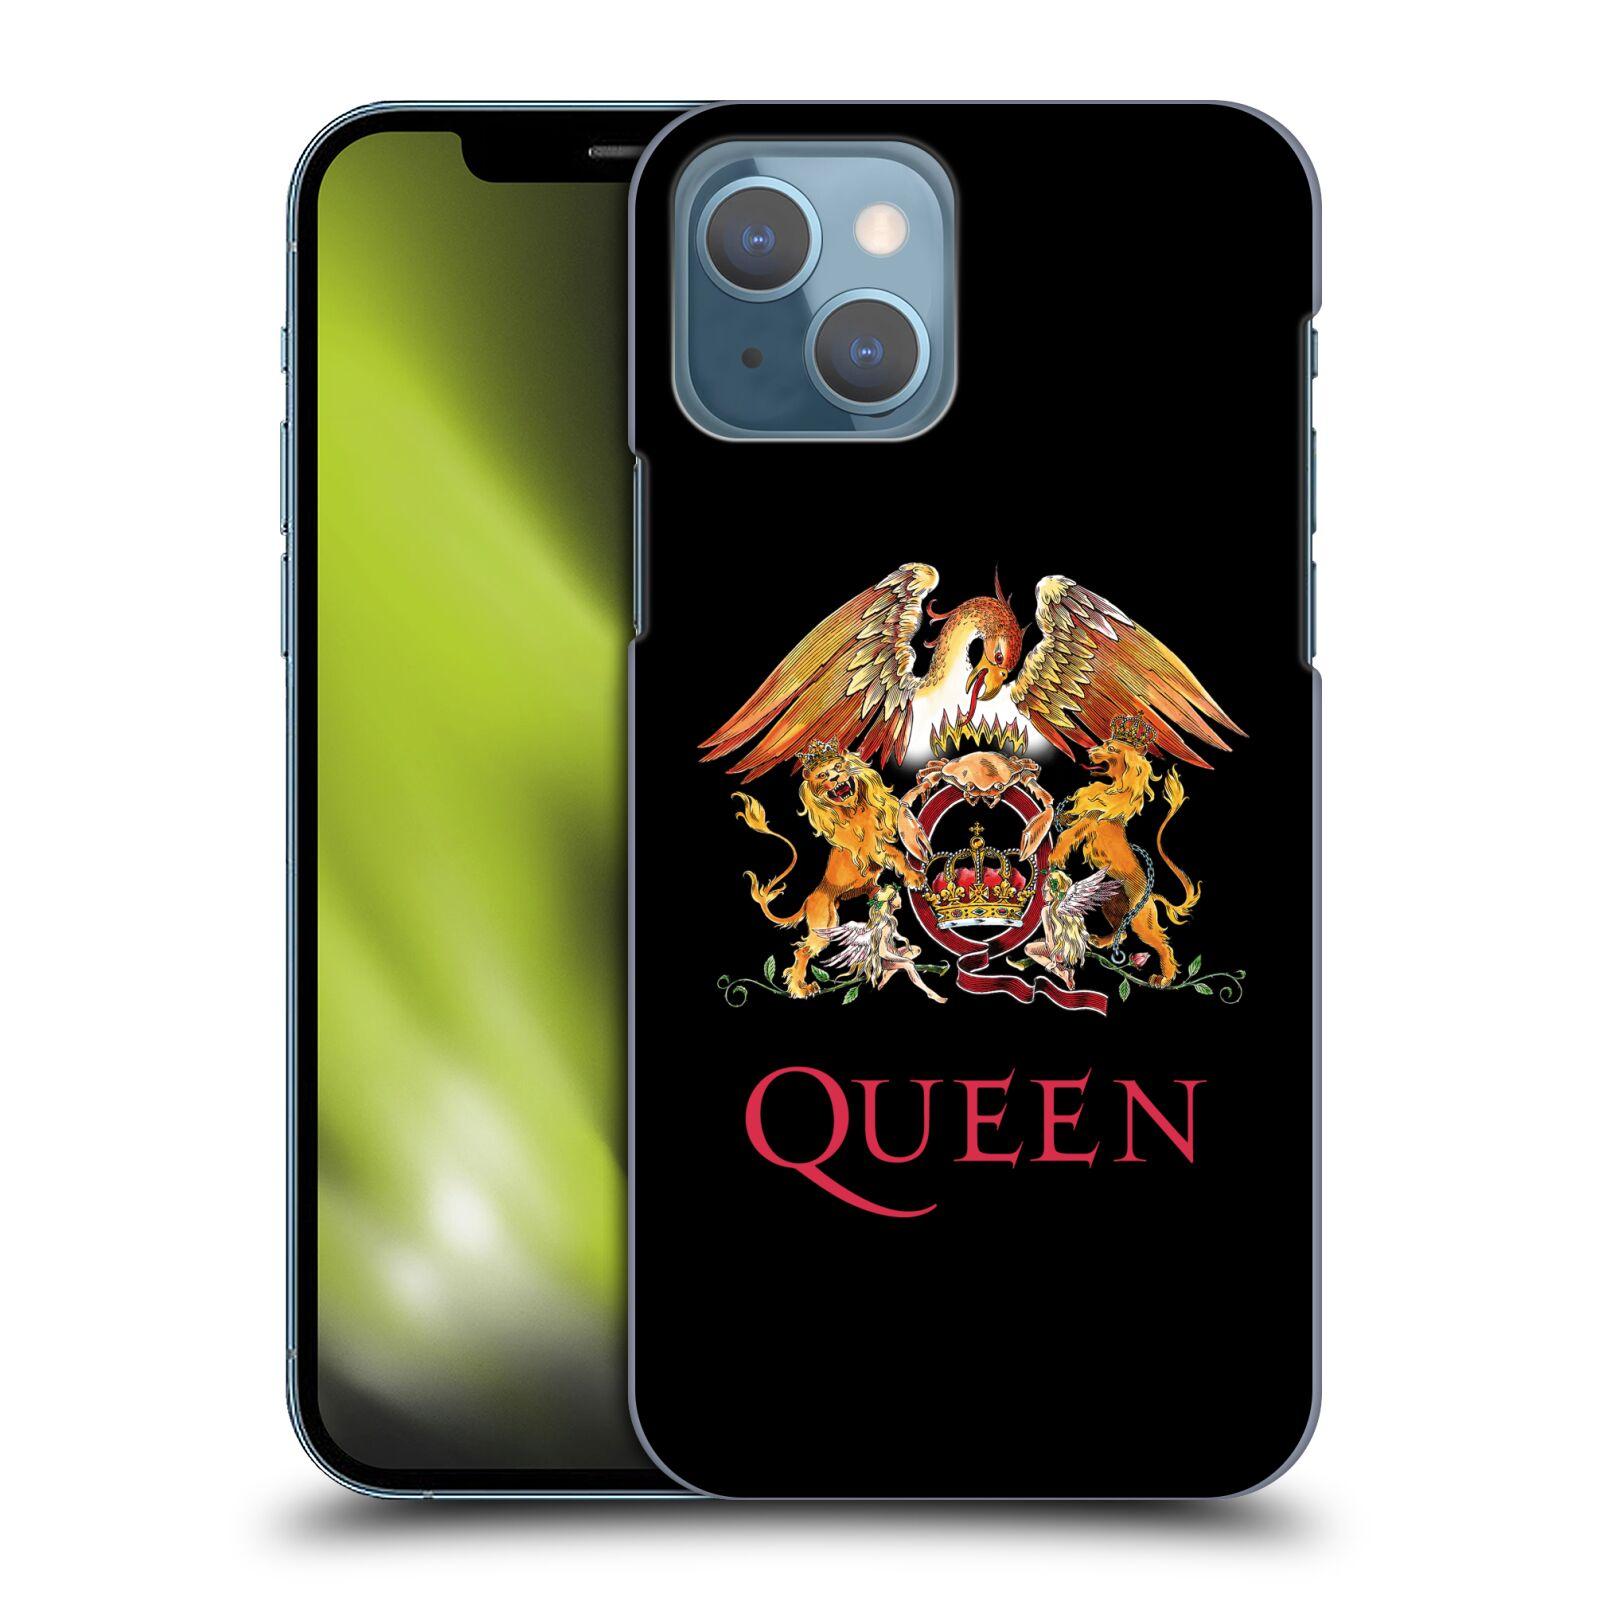 Plastové pouzdro na mobil Apple iPhone 13 - Head Case - Queen - Logo